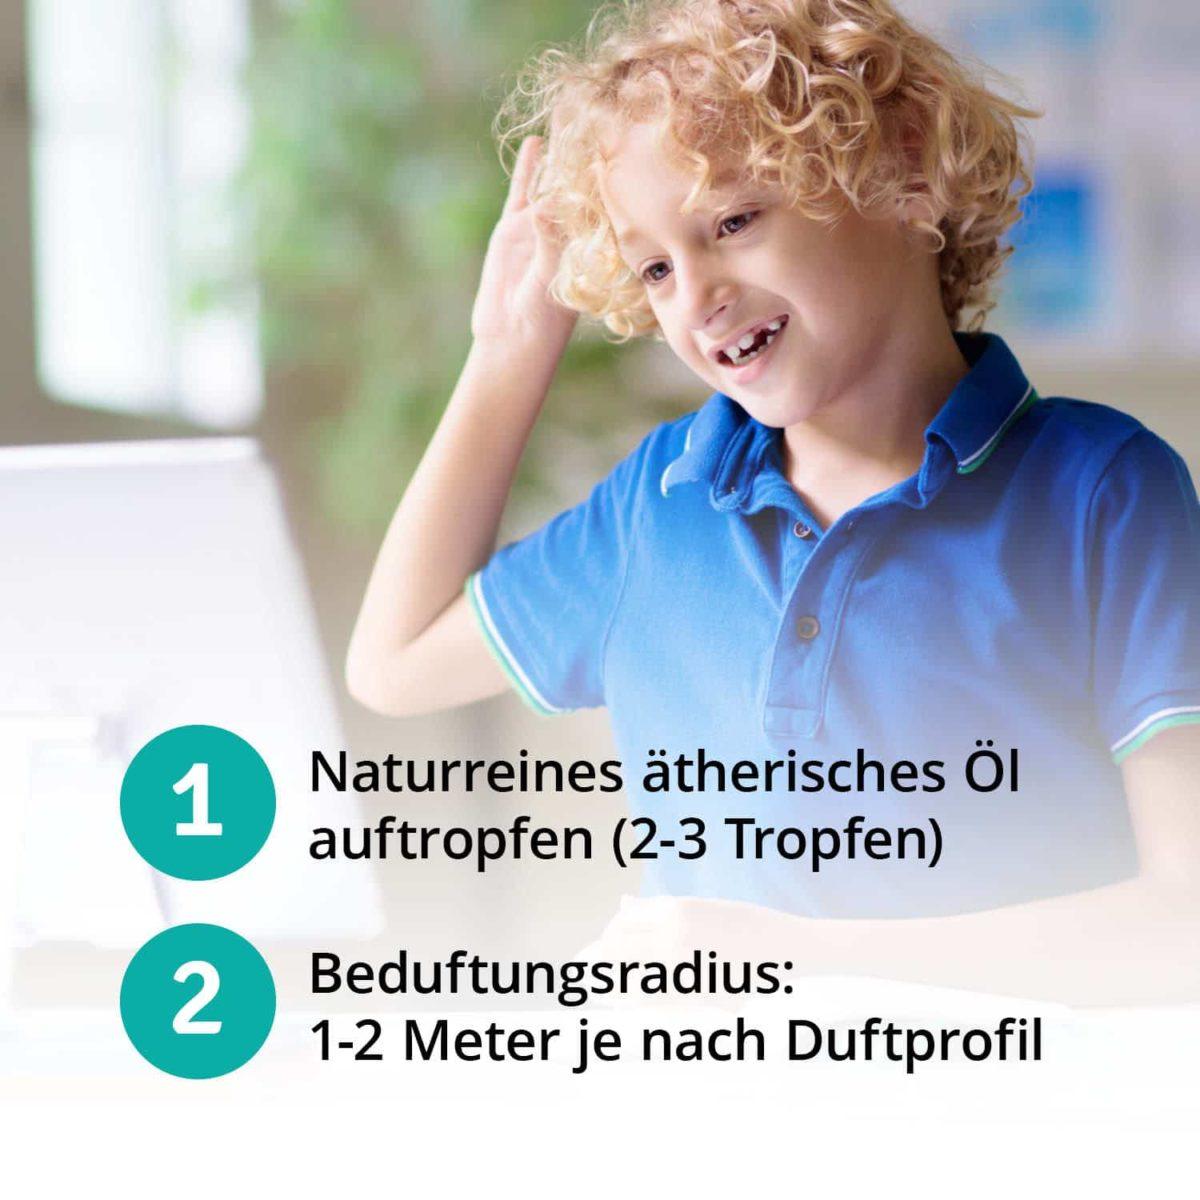 Casida Combo Fun Learning 1 Stk. 17439912  PZN Apotheke Aromatherapie Ätherische Öle Konzentration Fokus Duftmischung Schule